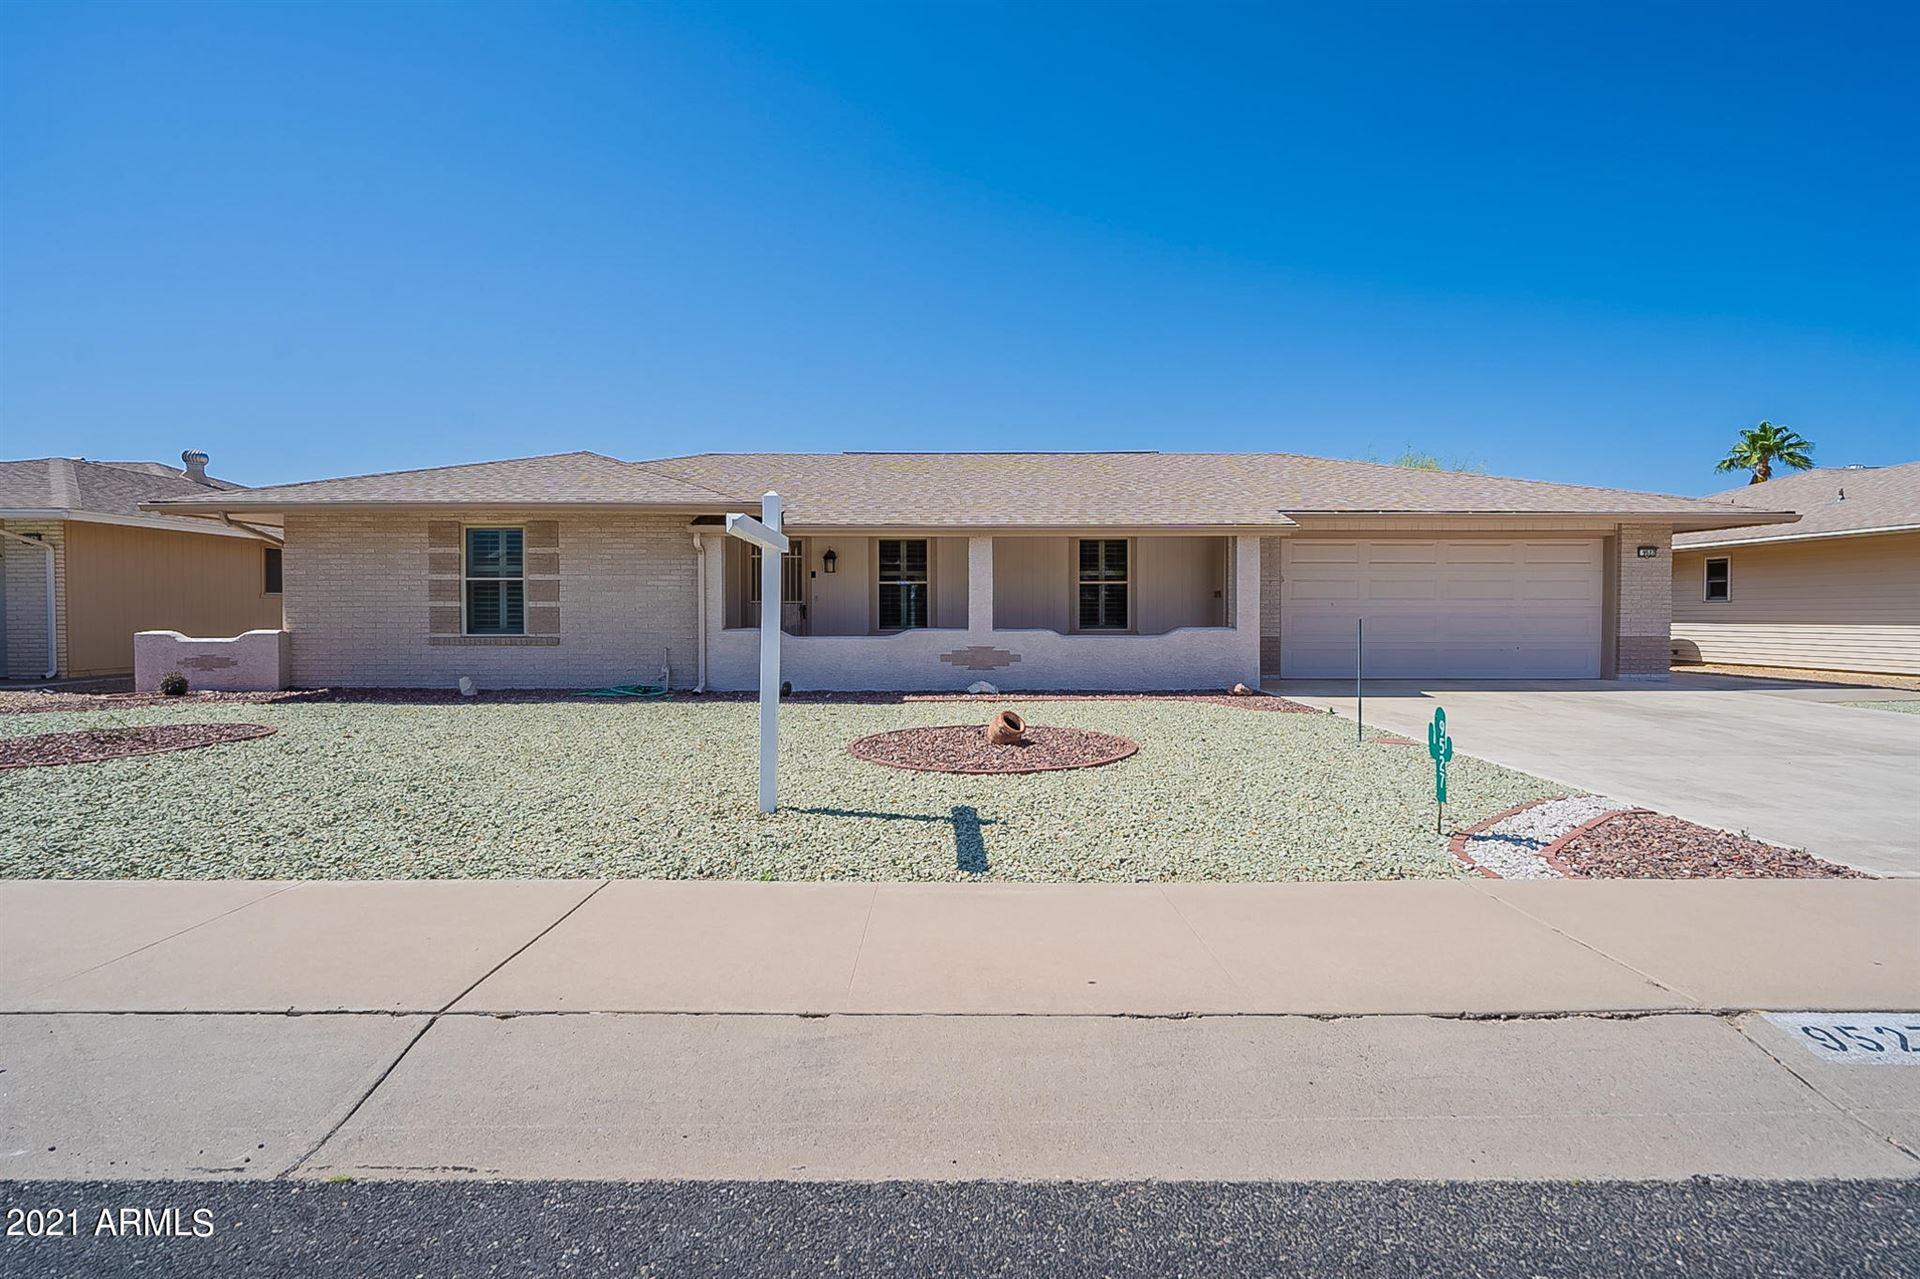 9527 W INDIAN HILLS Drive, Sun City, AZ 85351 - MLS#: 6229228